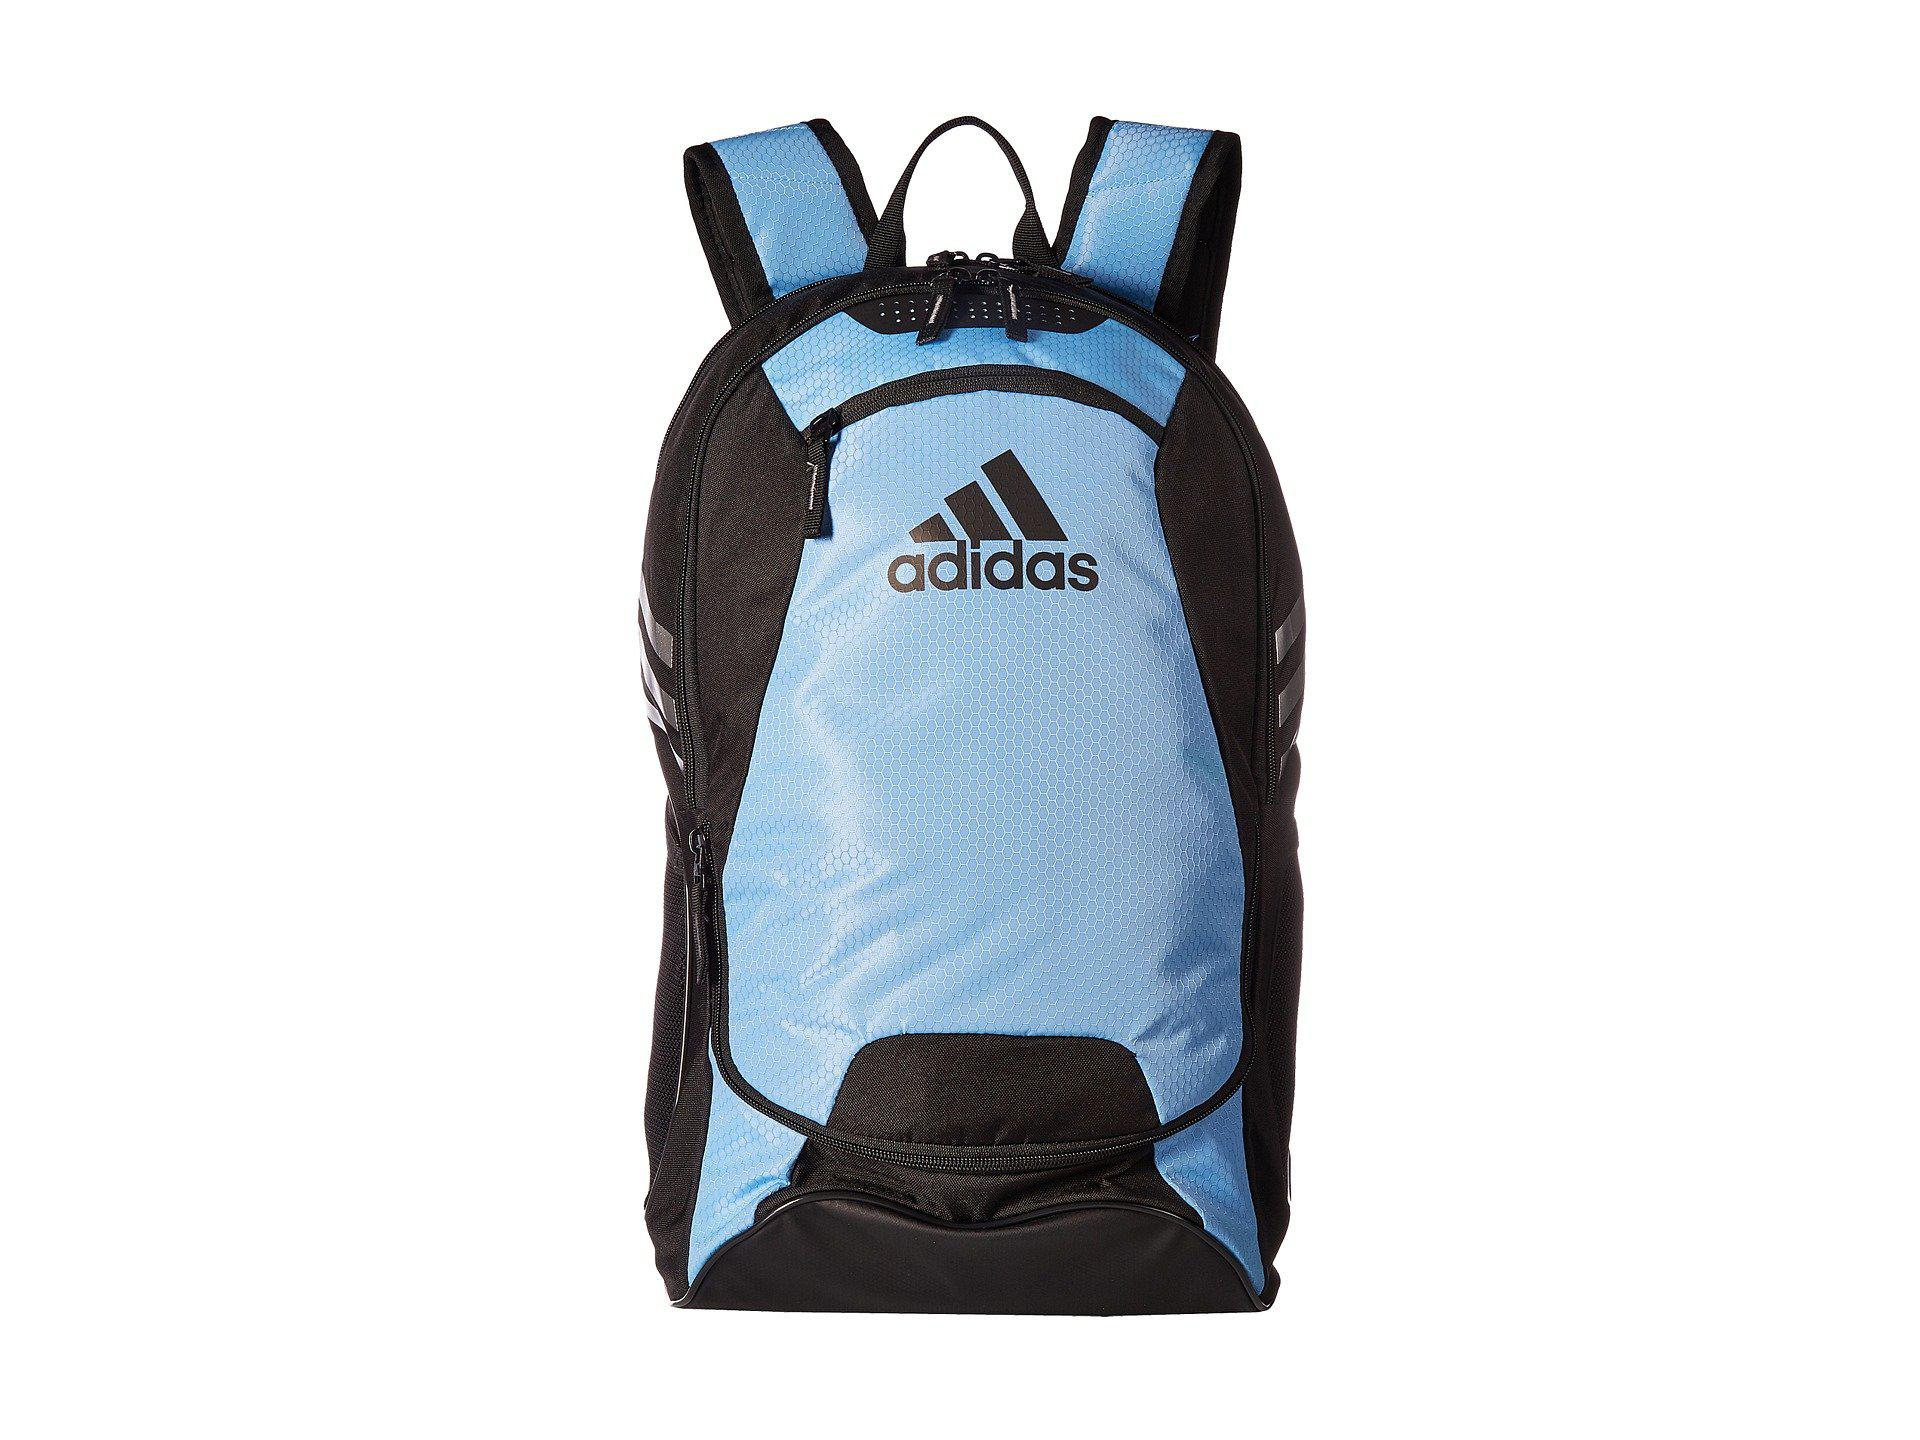 56ec4374c8 Adidas - Blue Stadium Ii Backpack - Lyst. View fullscreen